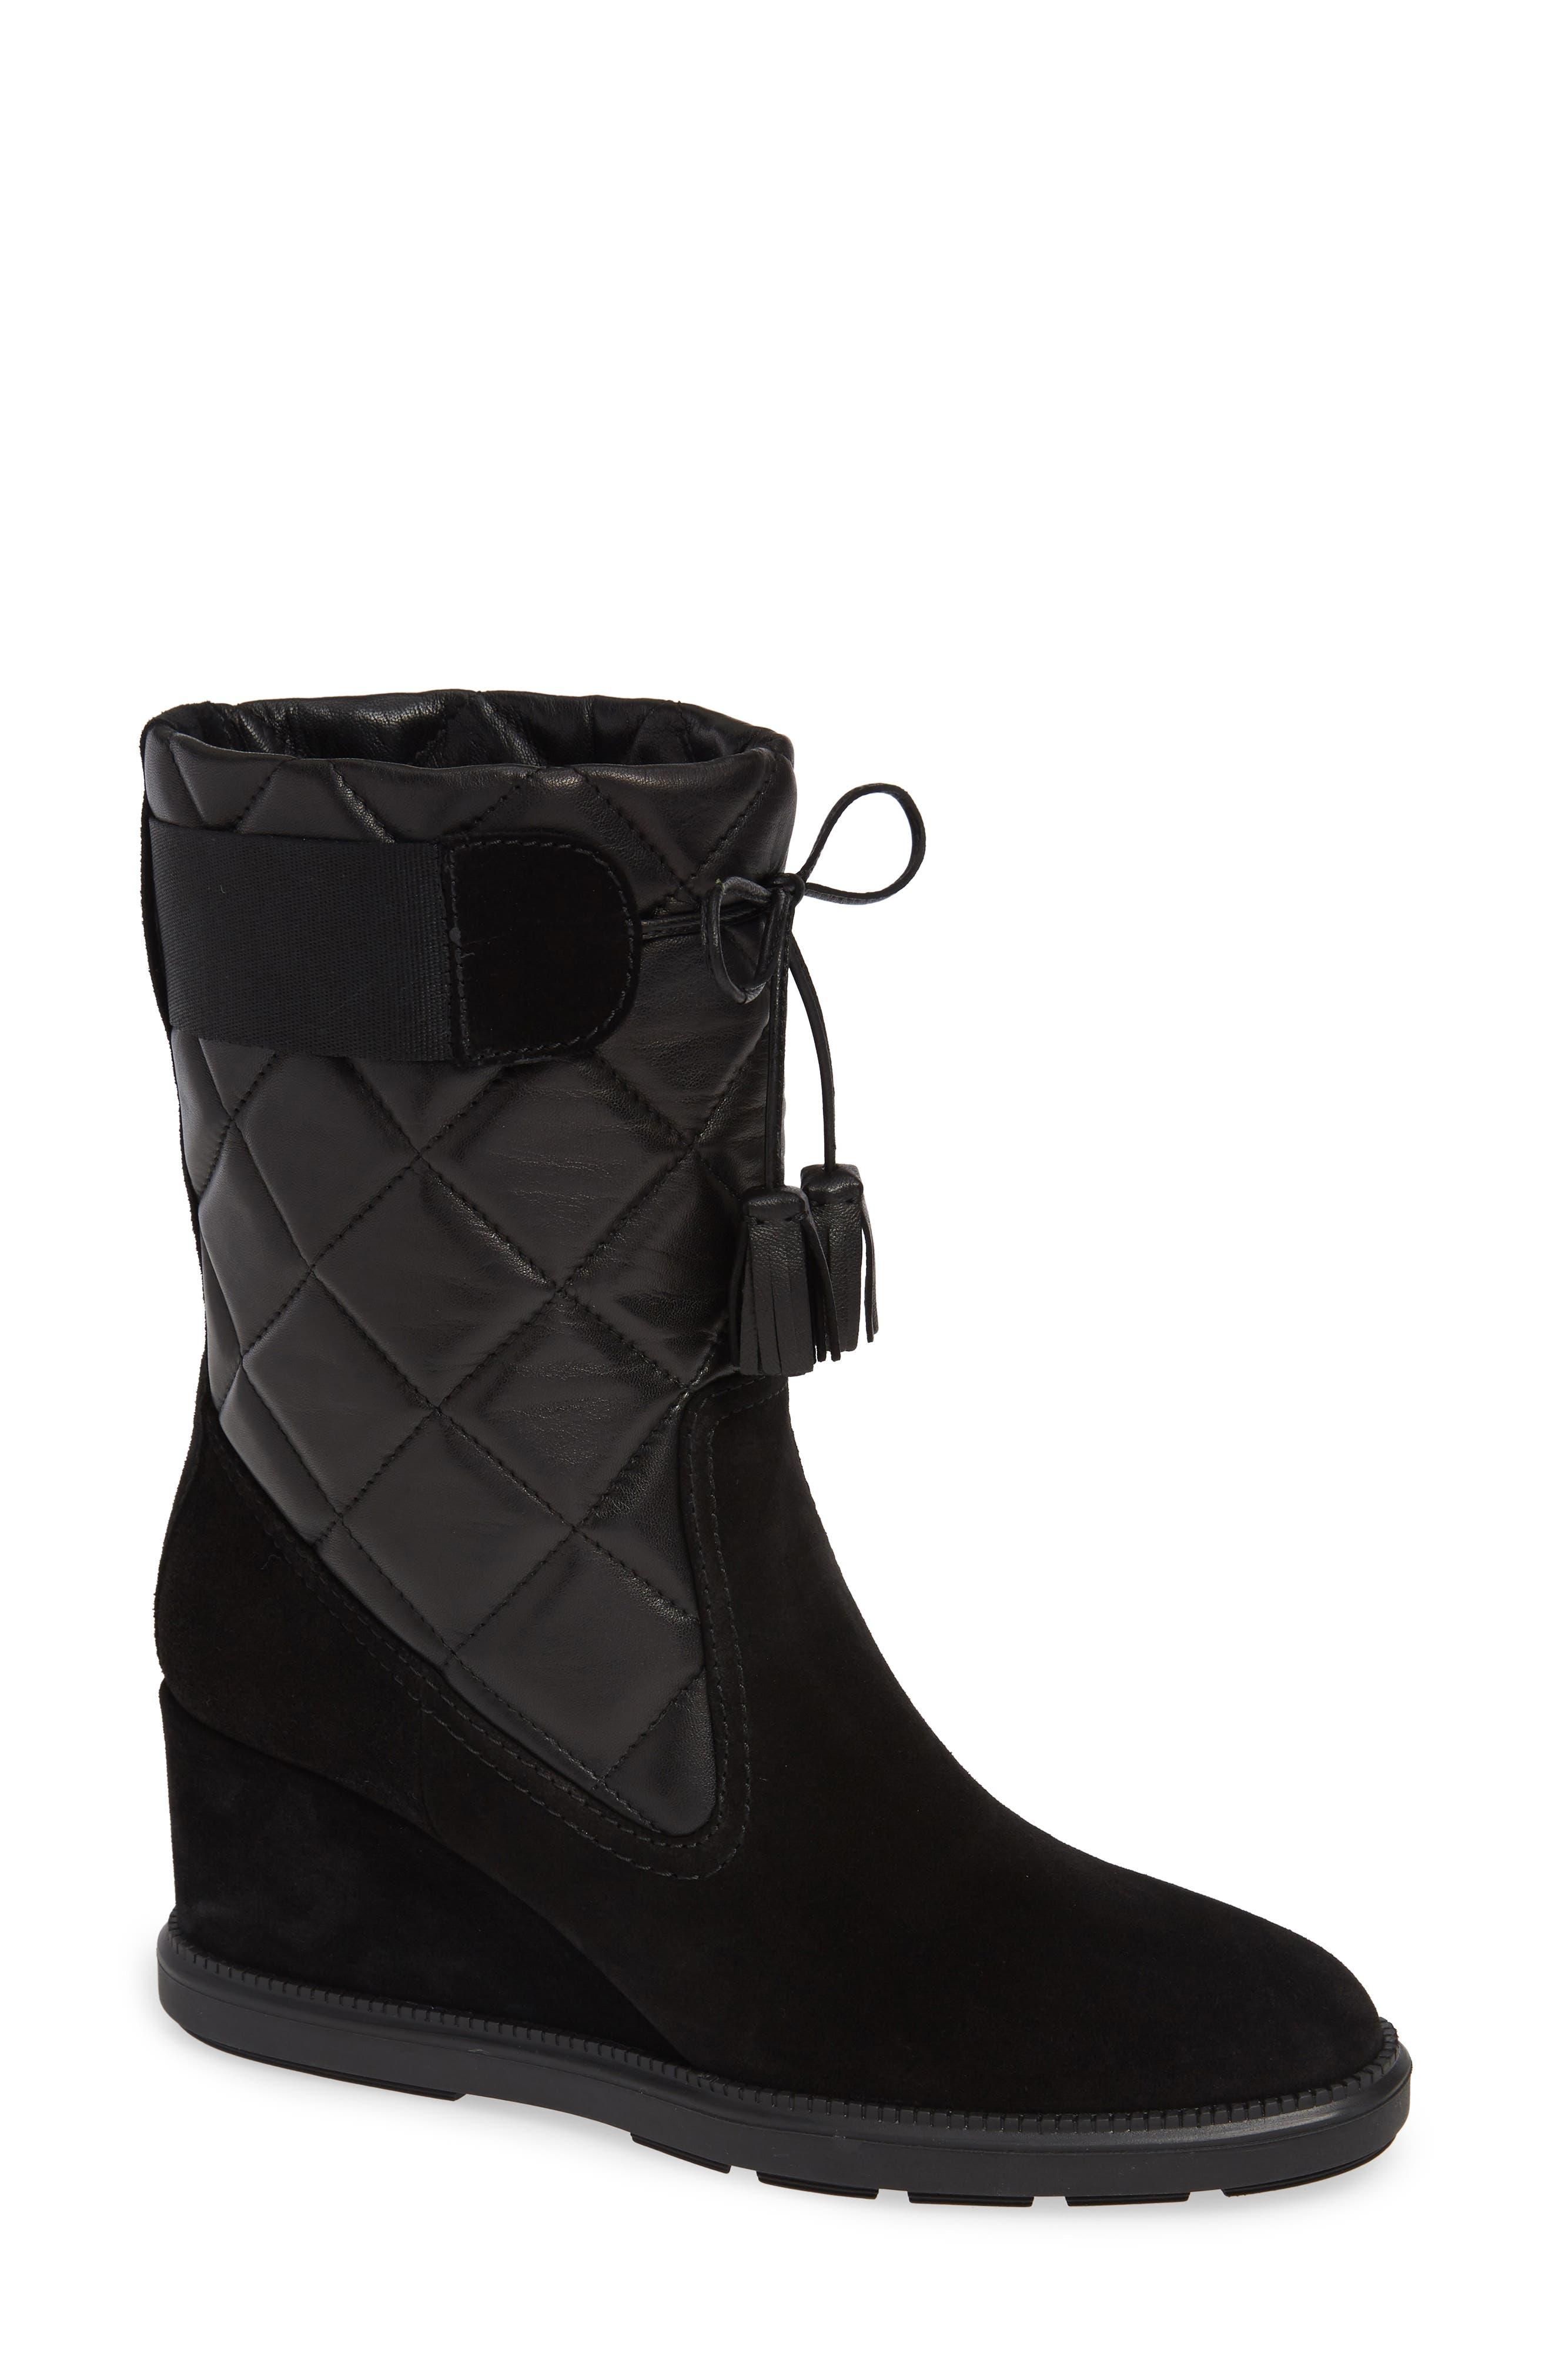 Aquatalia Caliana Water Resistant Boot- Black